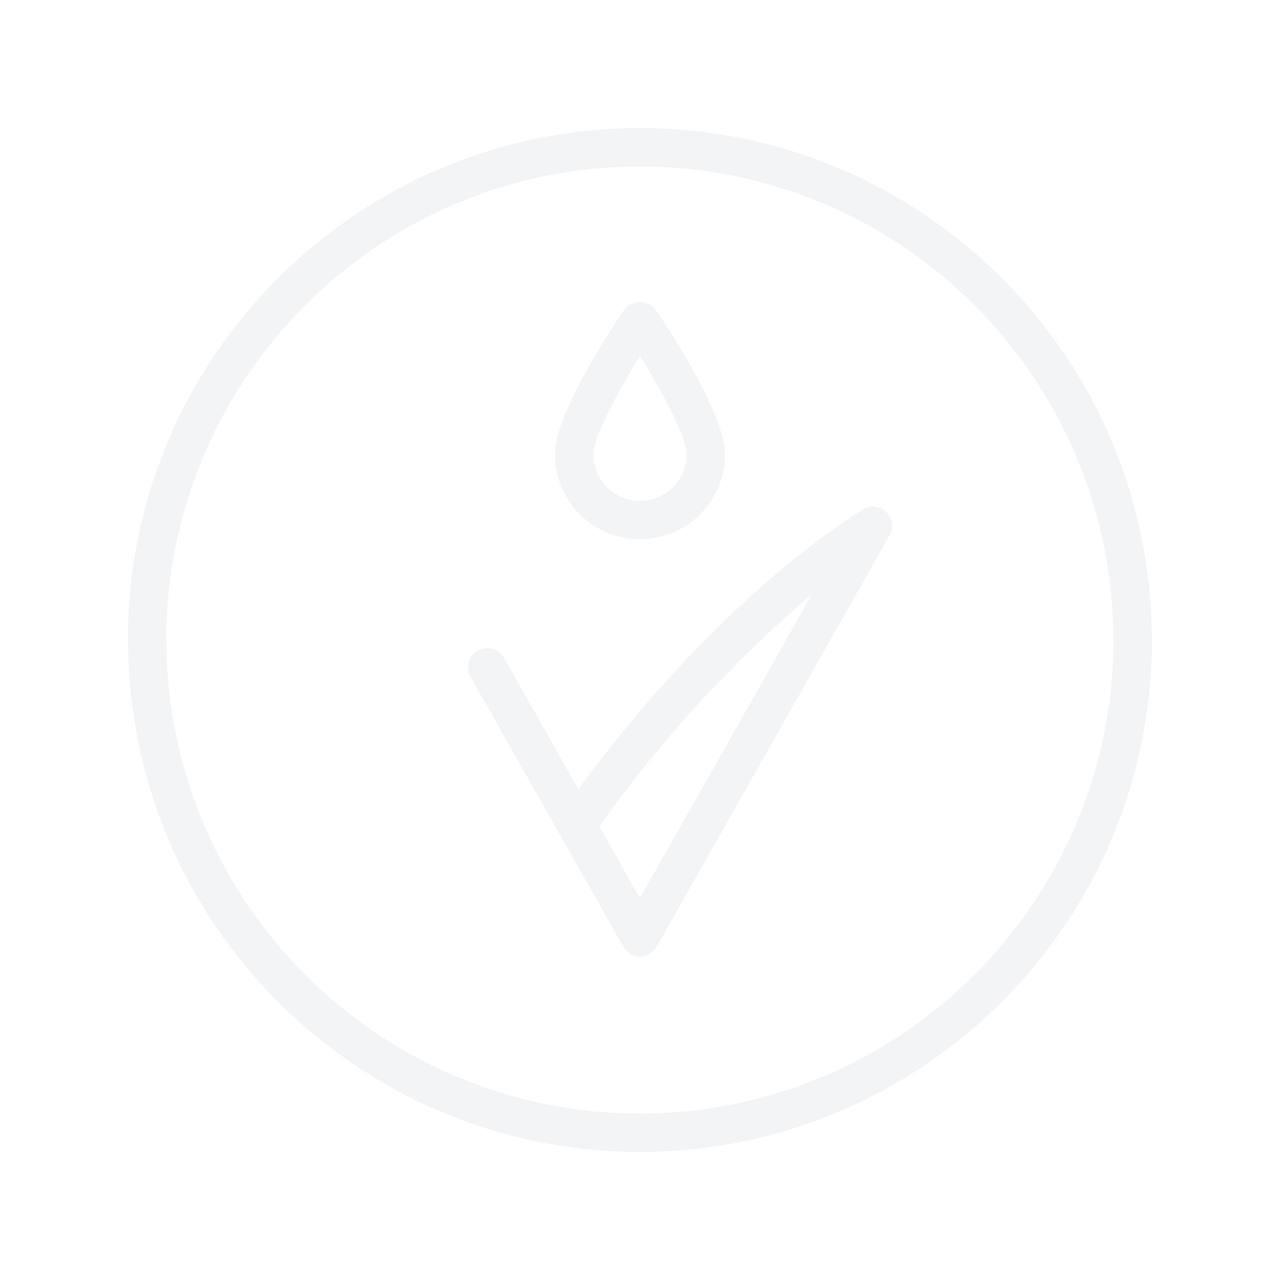 CLARINS Eau Ressourcante Deodorant Mist 100ml